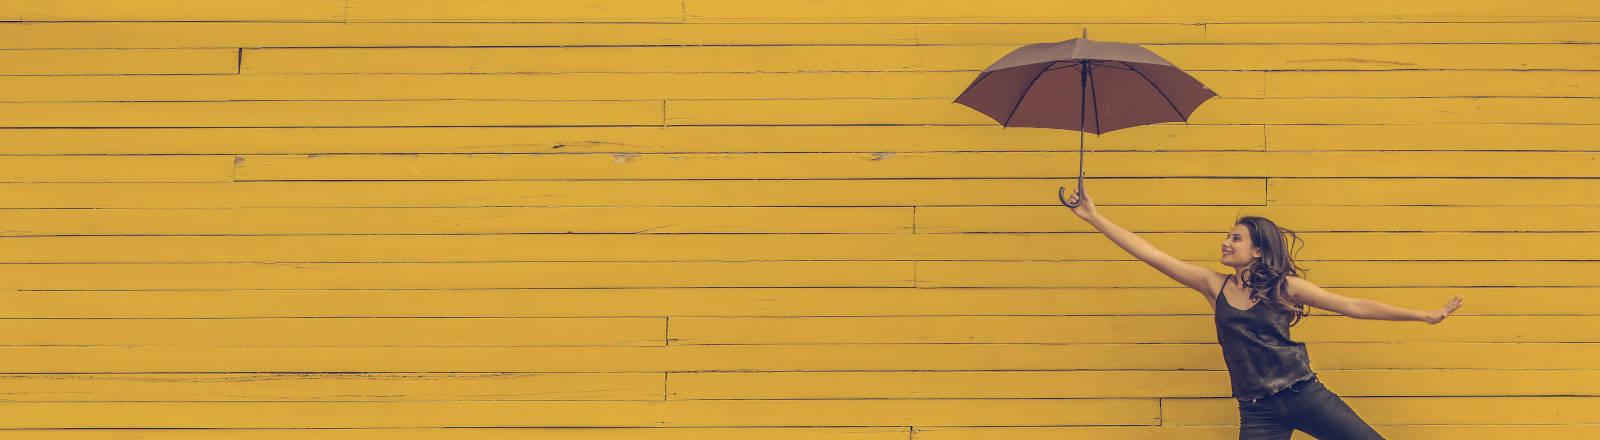 Frau mit geöffnetem Regenschirm